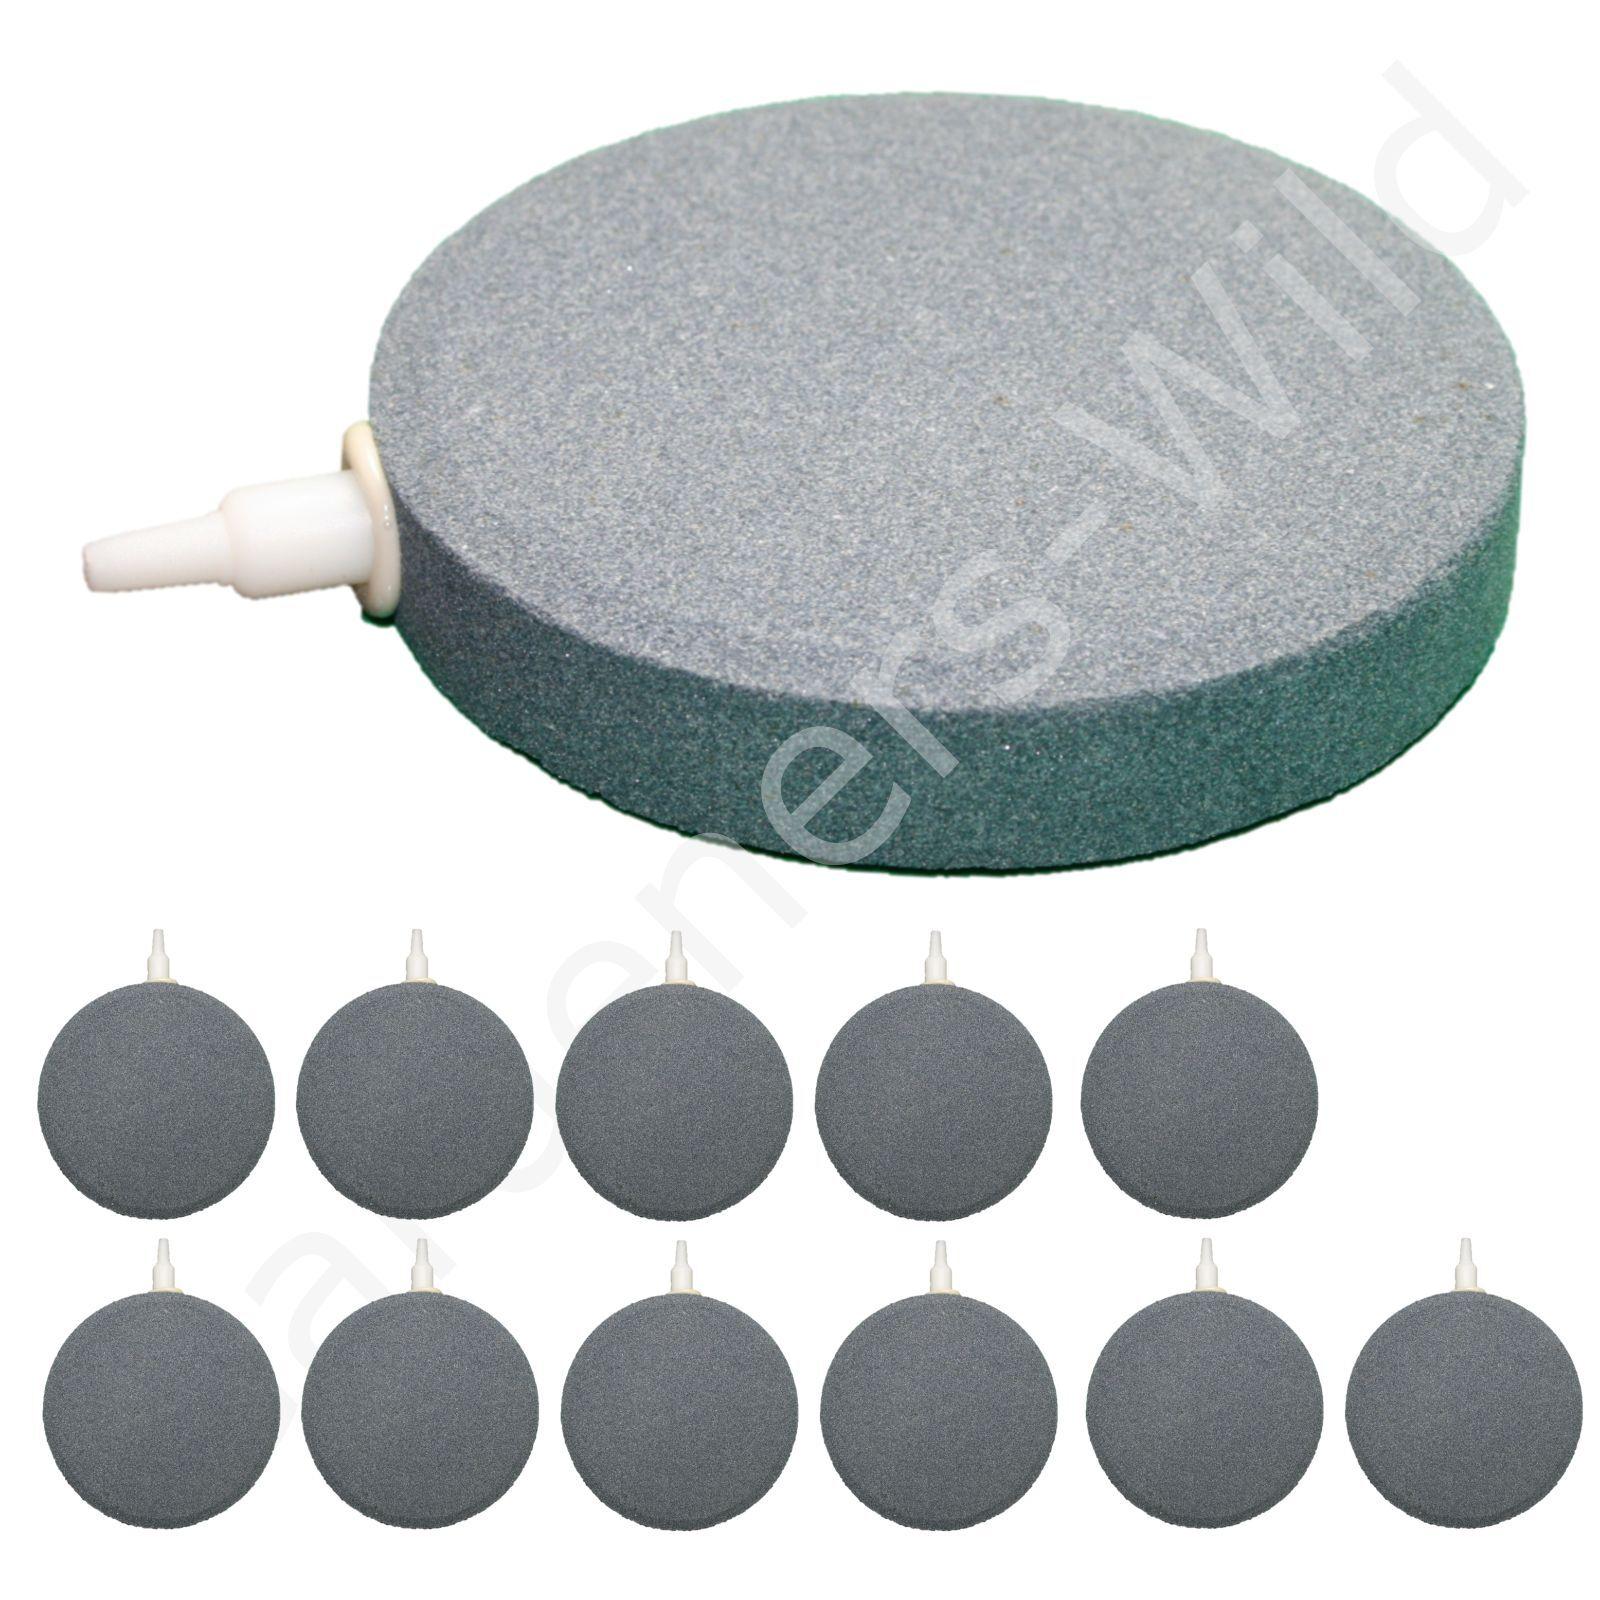 4  10cm AIR STONE (x12) HAILEA large round ceramic airstone hydroponic pond koi